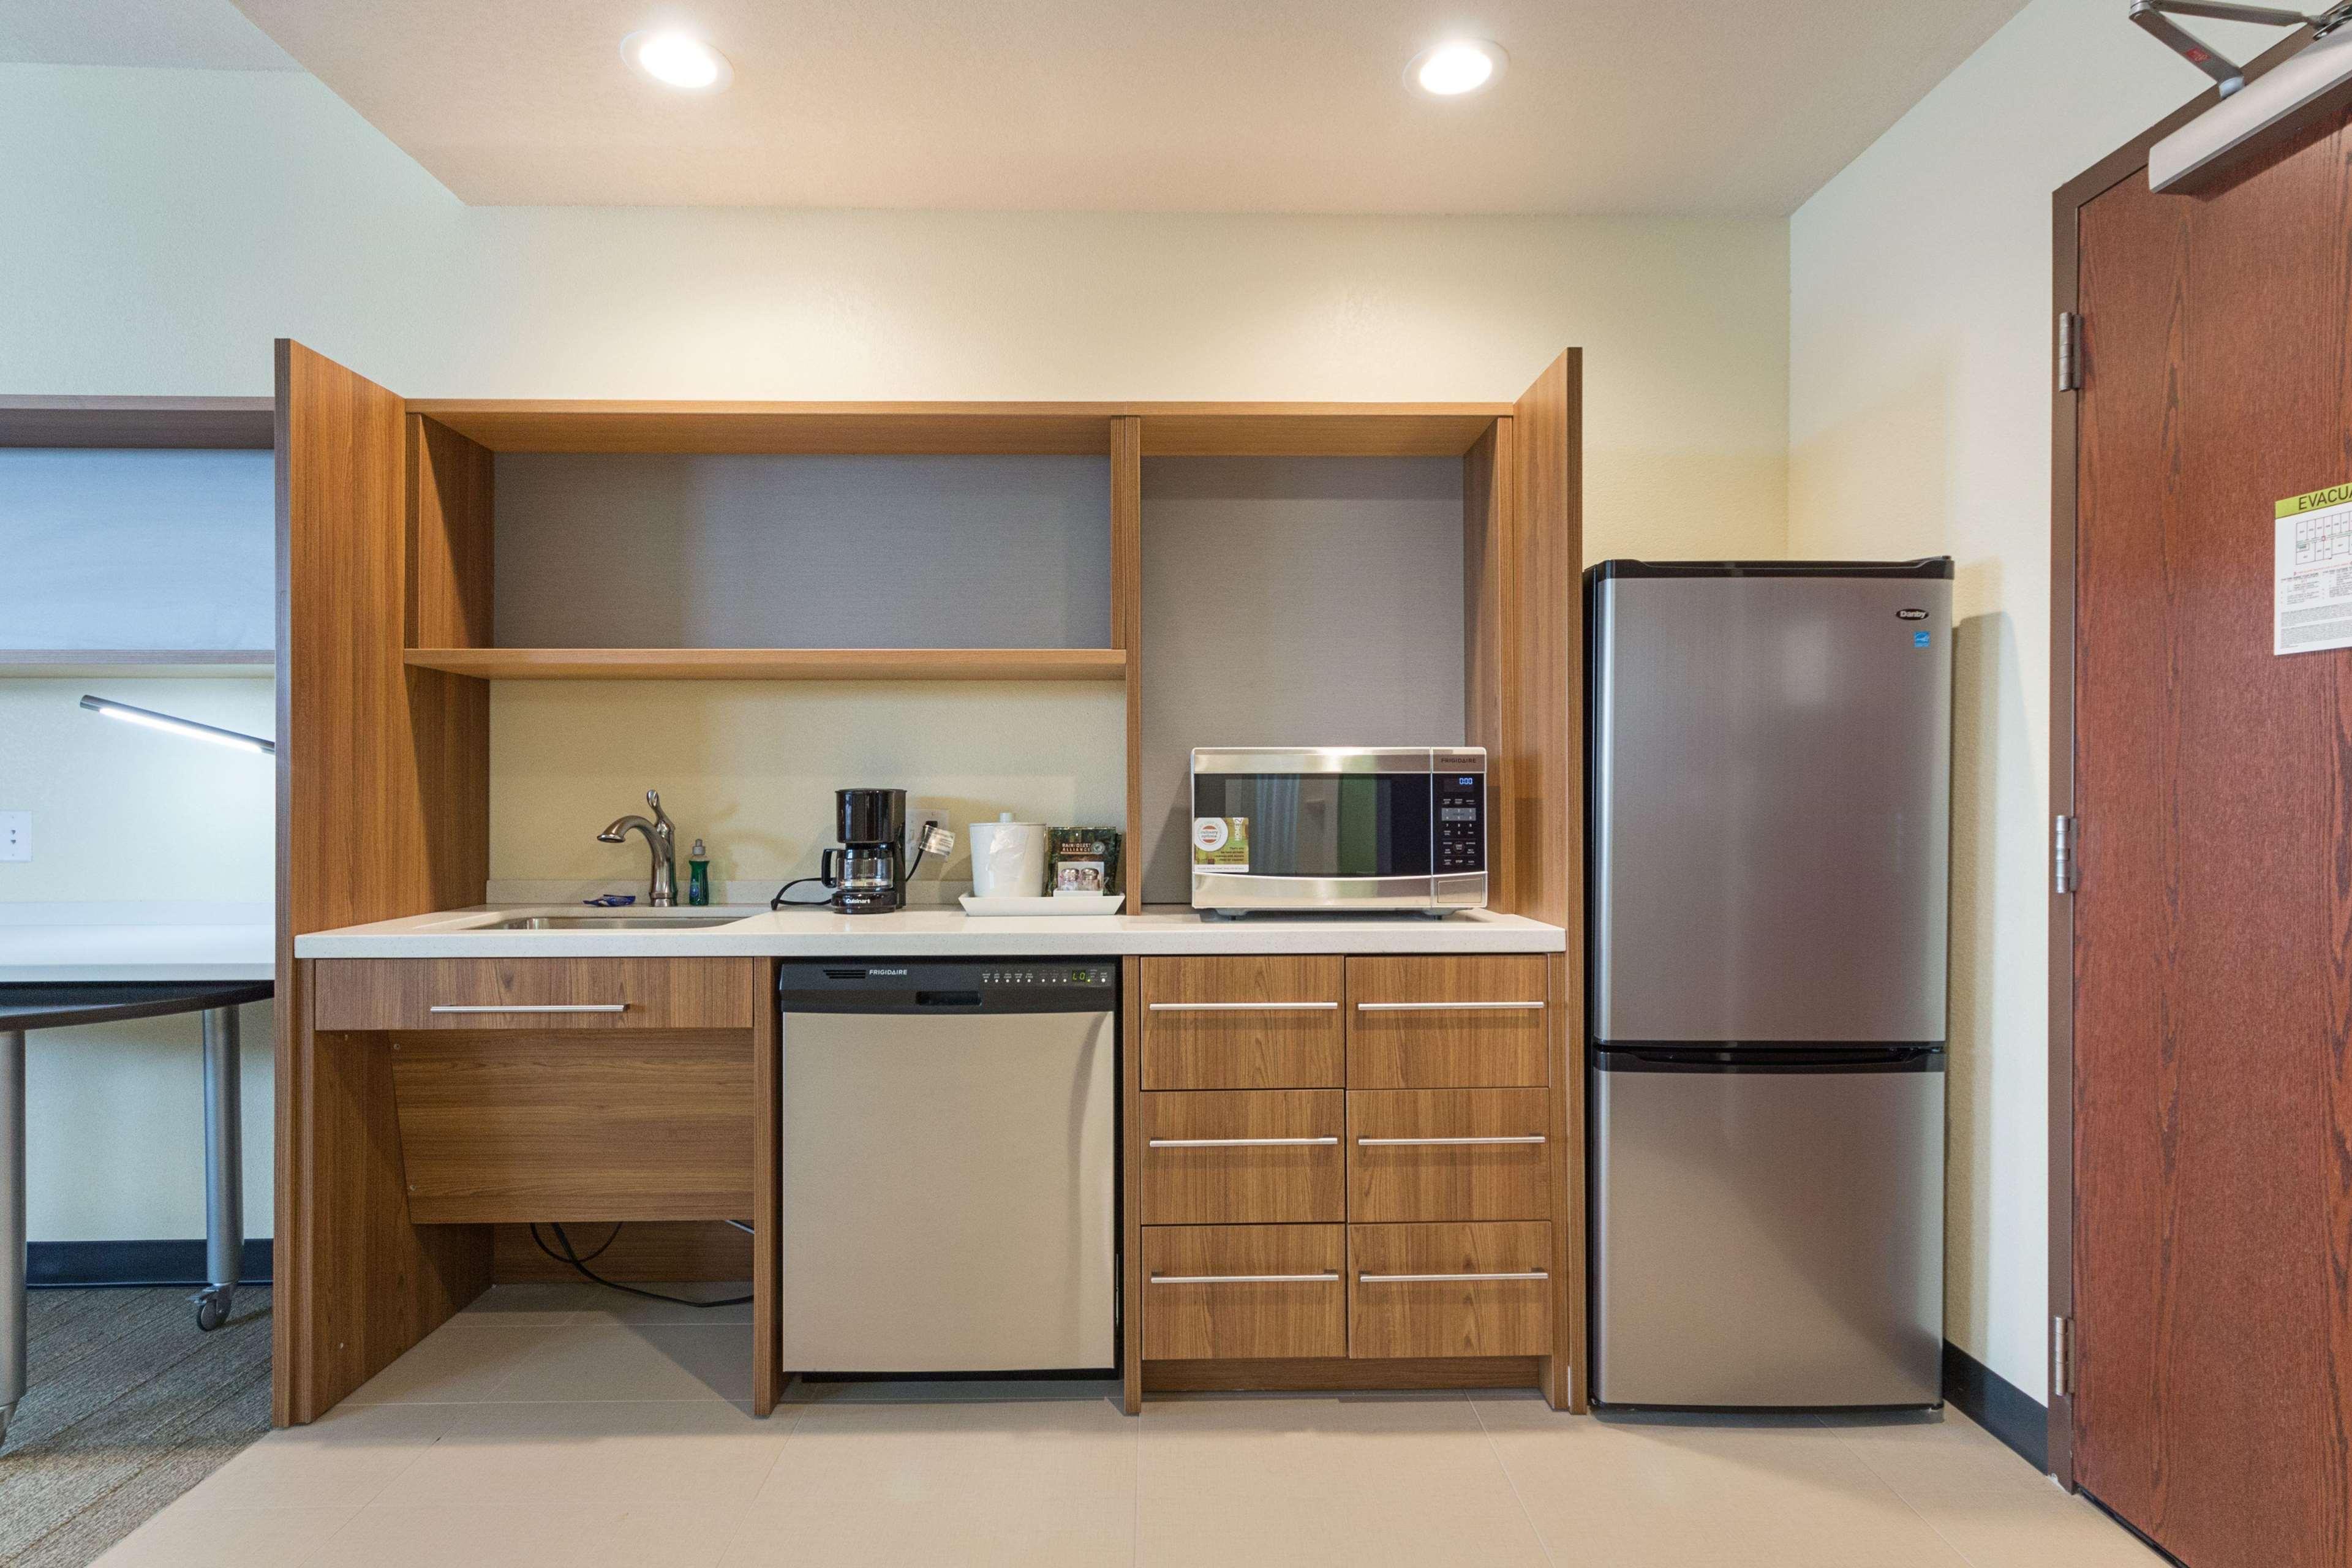 Home 2 Suites by Hilton - Yukon image 47